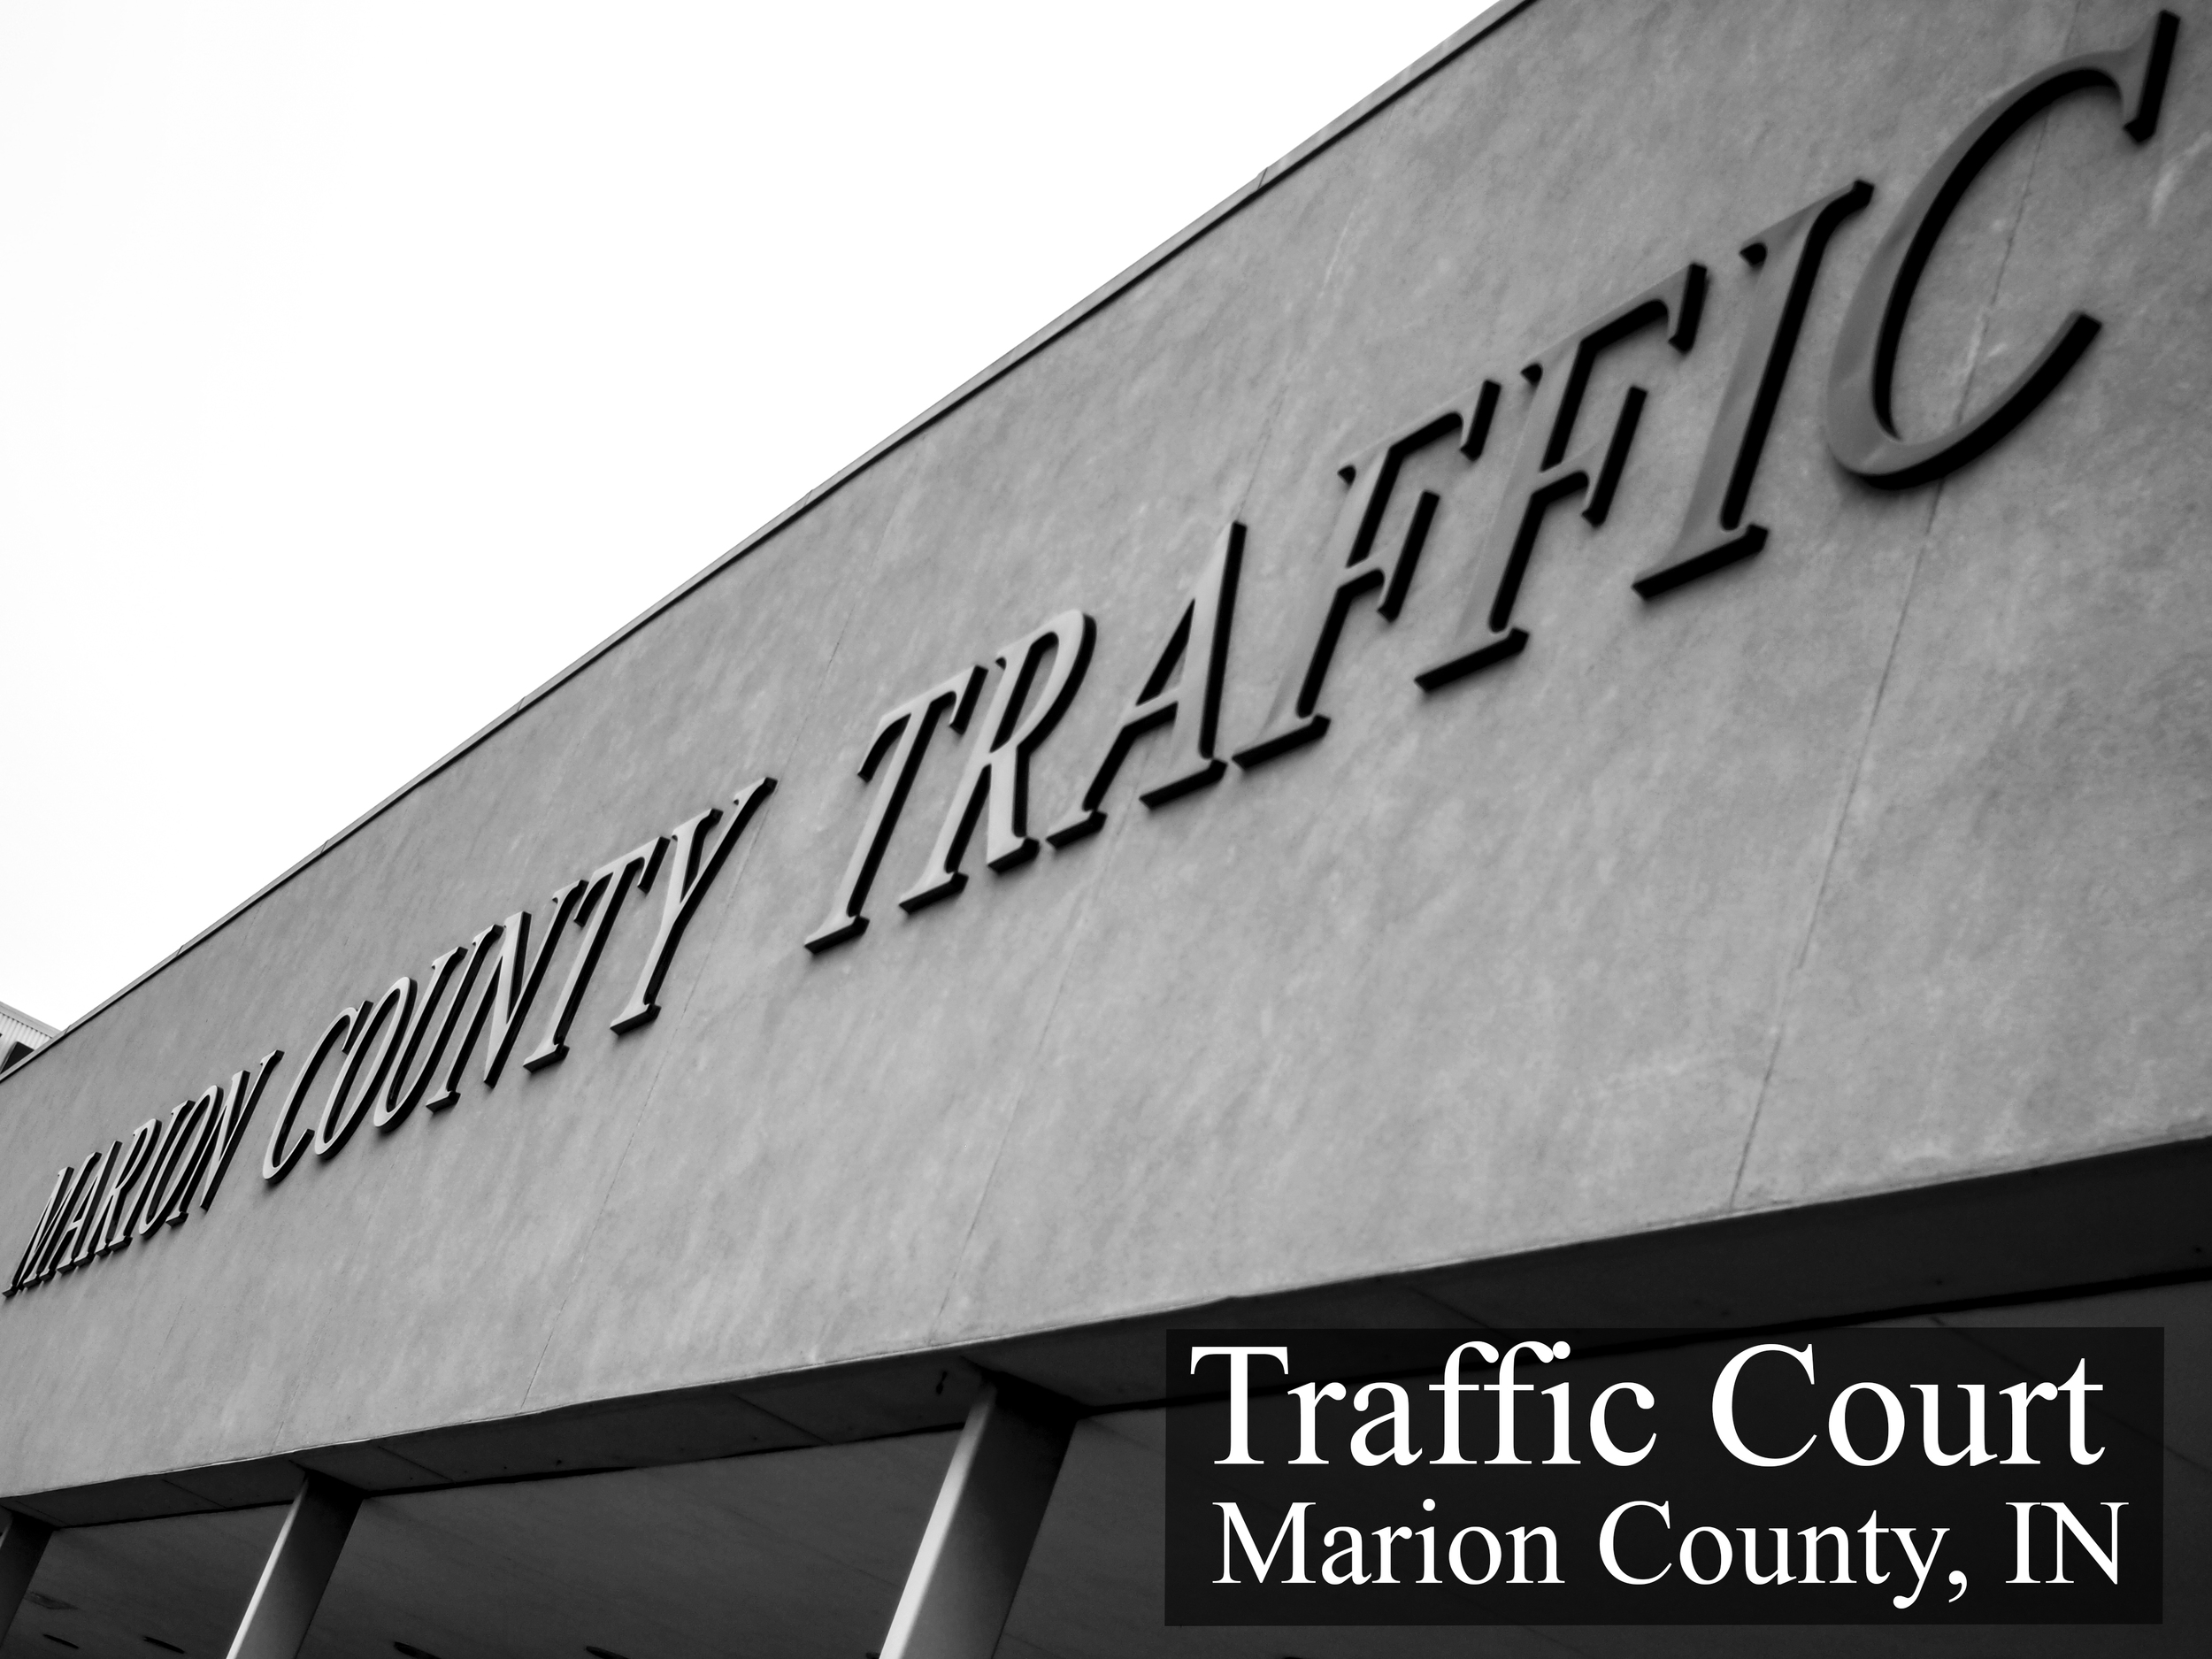 TrafficCourt.jpg